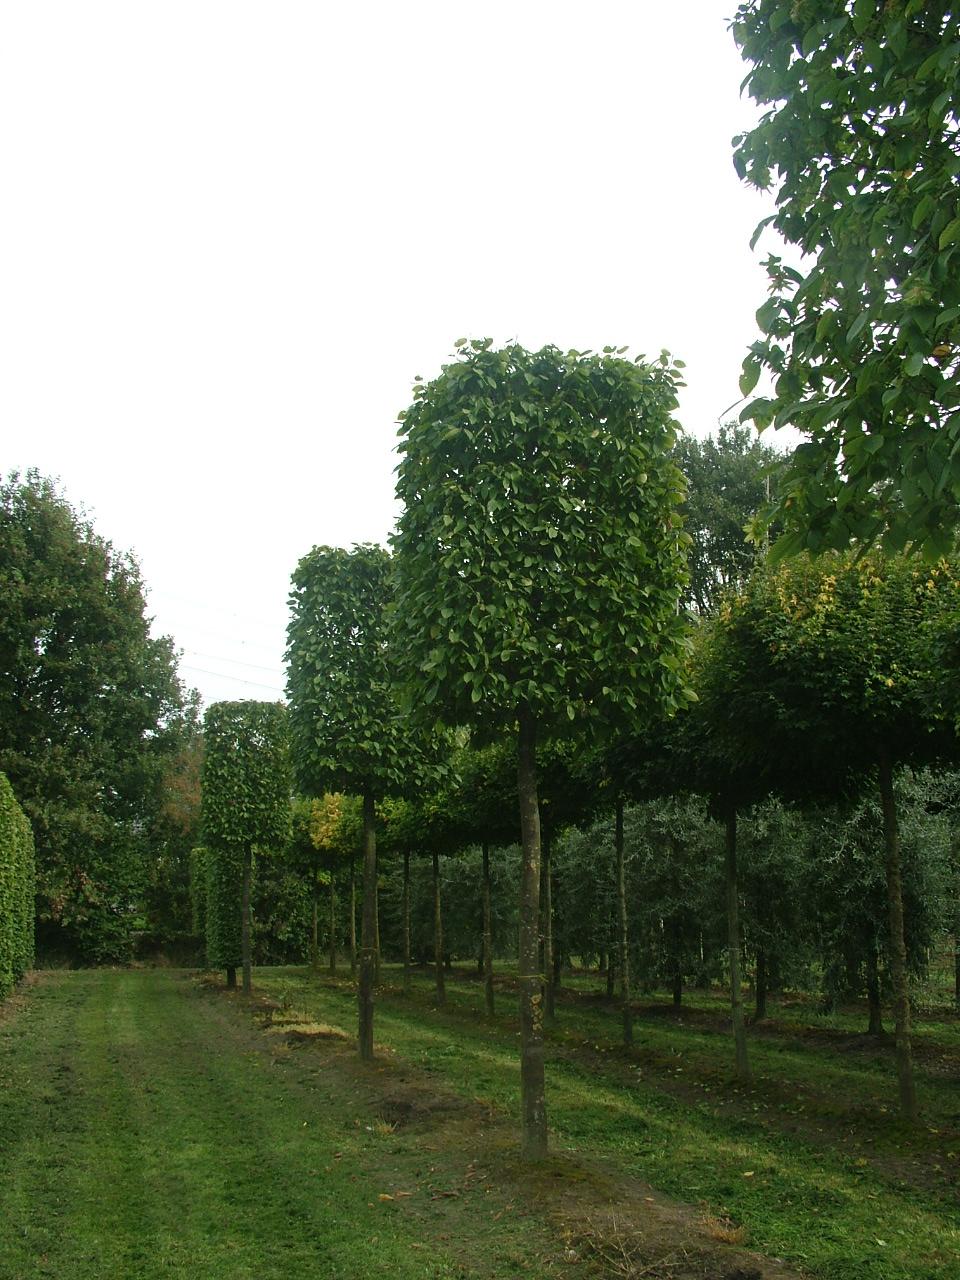 Hornbeam boxhead trees